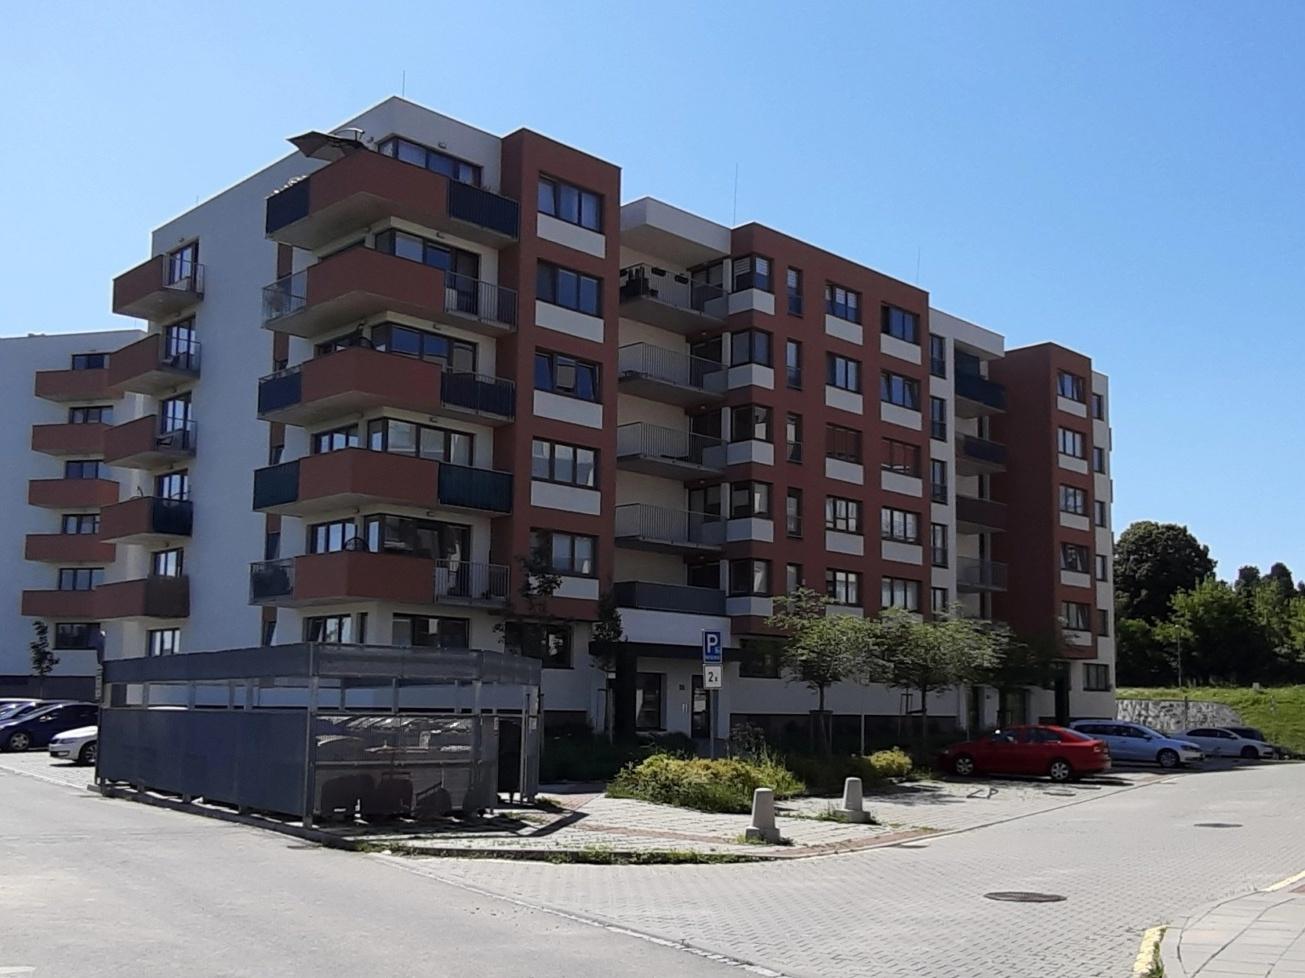 Prodej bytu 3+kk Olomouc - Řepčín, ulice Edvarda Beneše - Holandská čtvrť